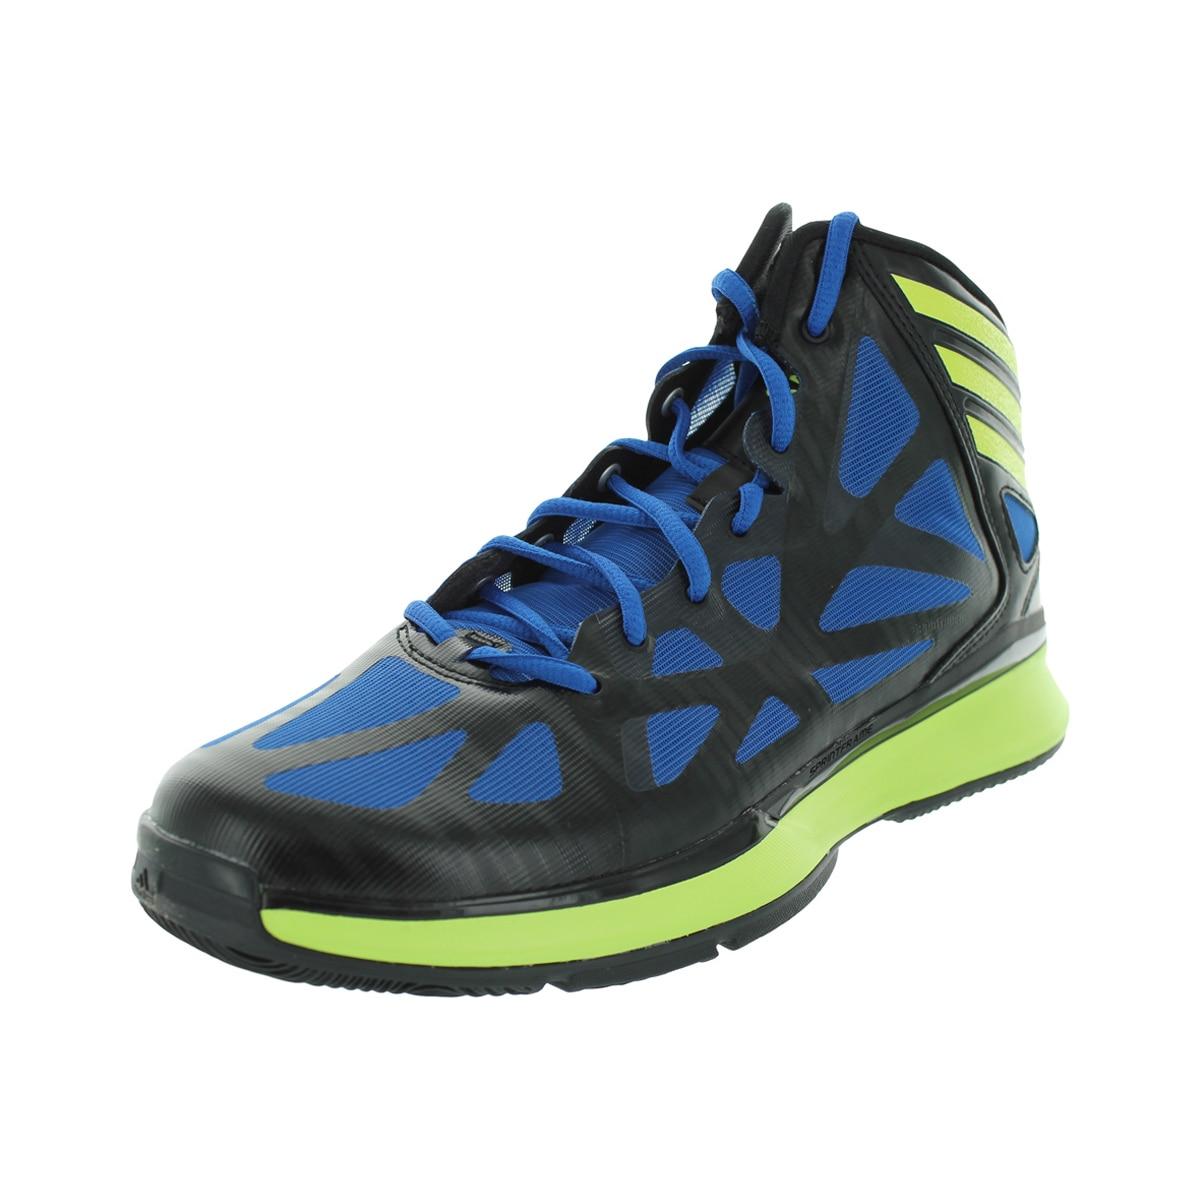 Adidas Men's Crazy Shadow 2 Black/Electr/Bluebea Basketba...